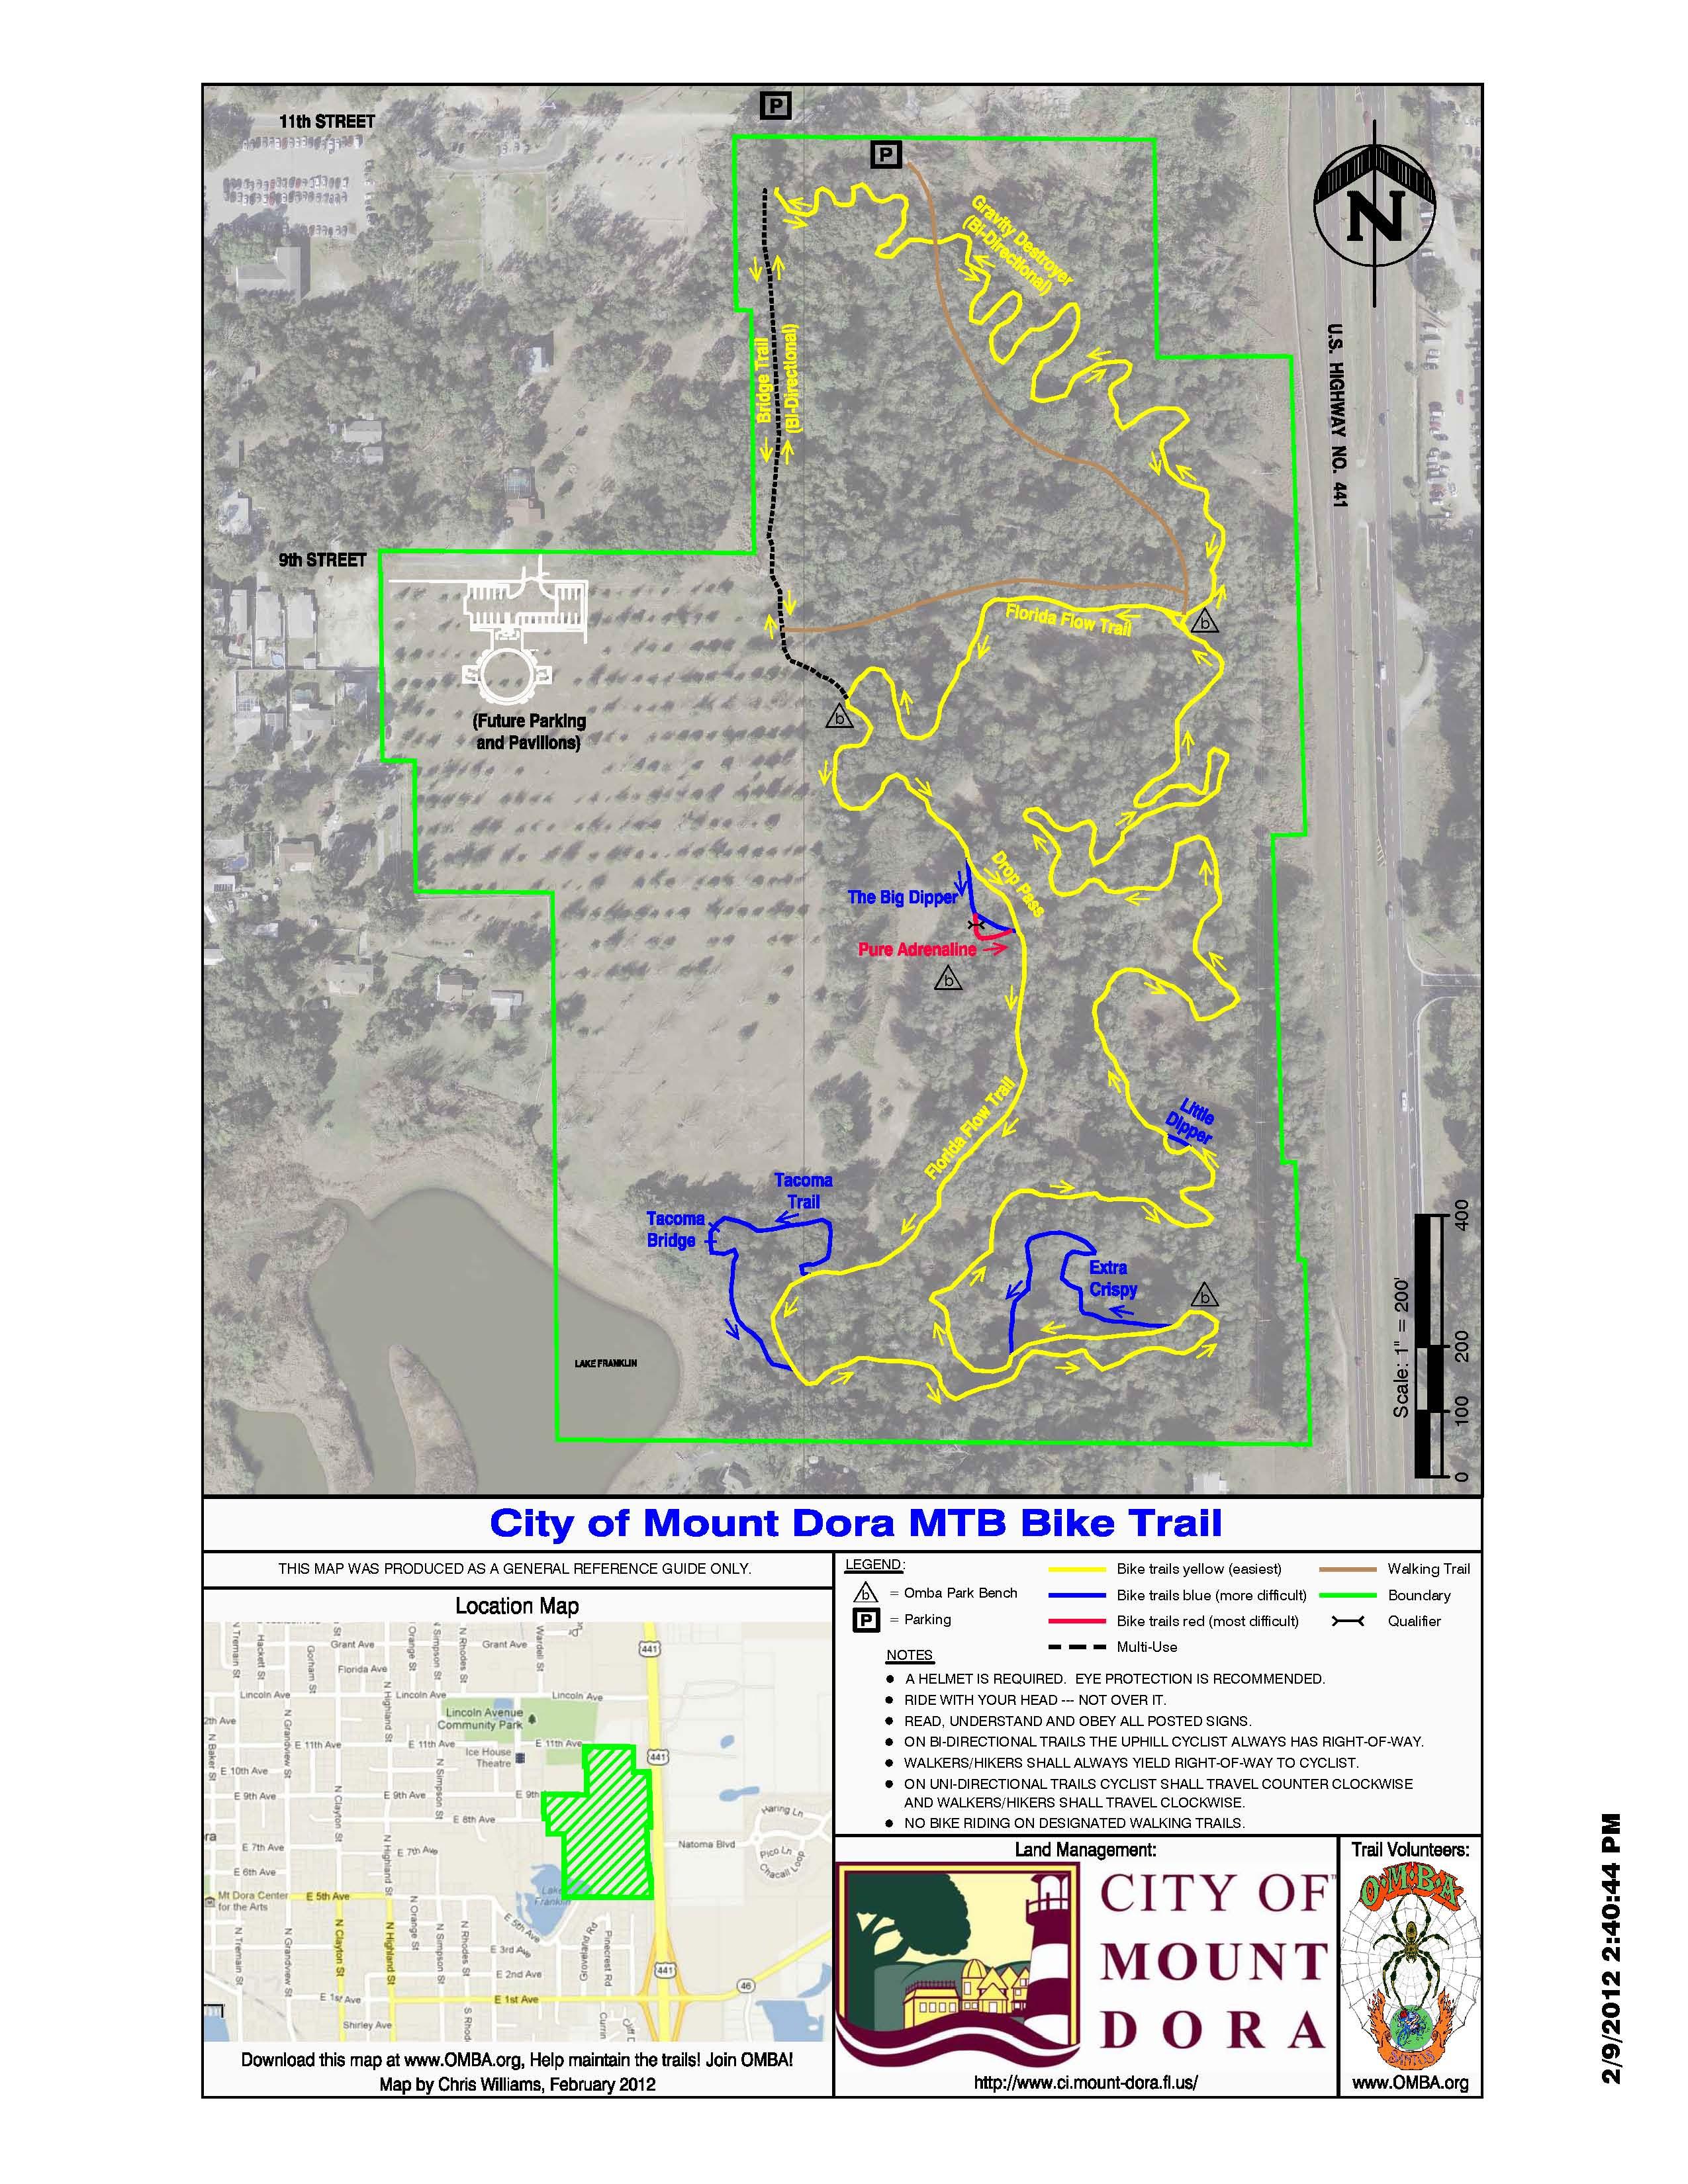 Central Florida Mountain Bike Trails: Mount Dora Bike Trail - Central Florida Bike Trails Map